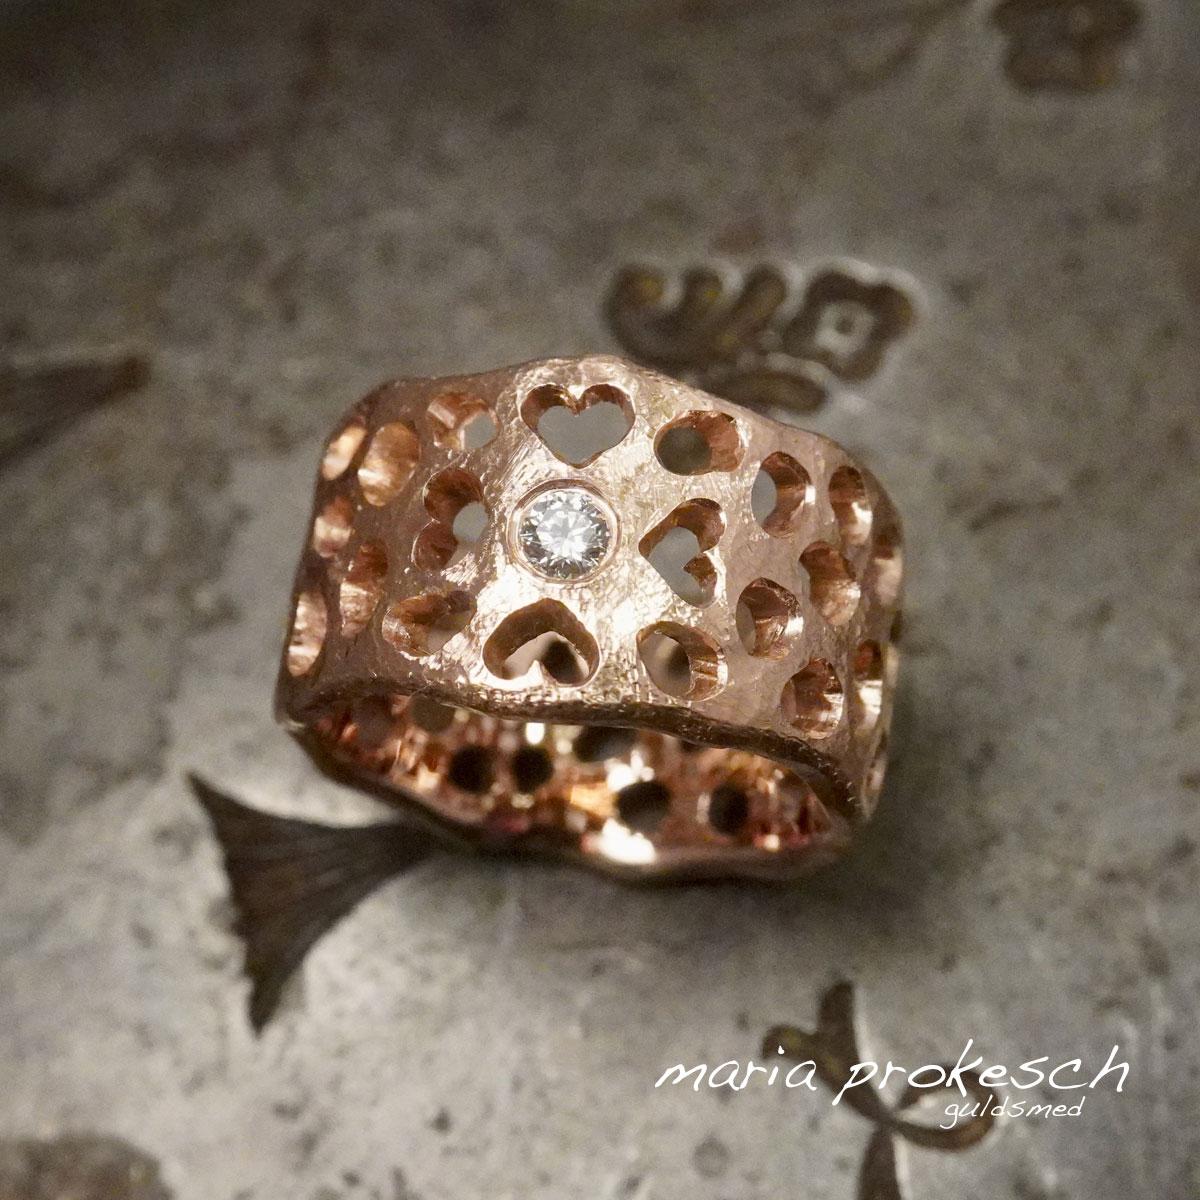 Damering i 14 kt rosaguld med udsavninger som hulmønster. Fire hjerter som symbol for familien. Rustikt håndlavet design.